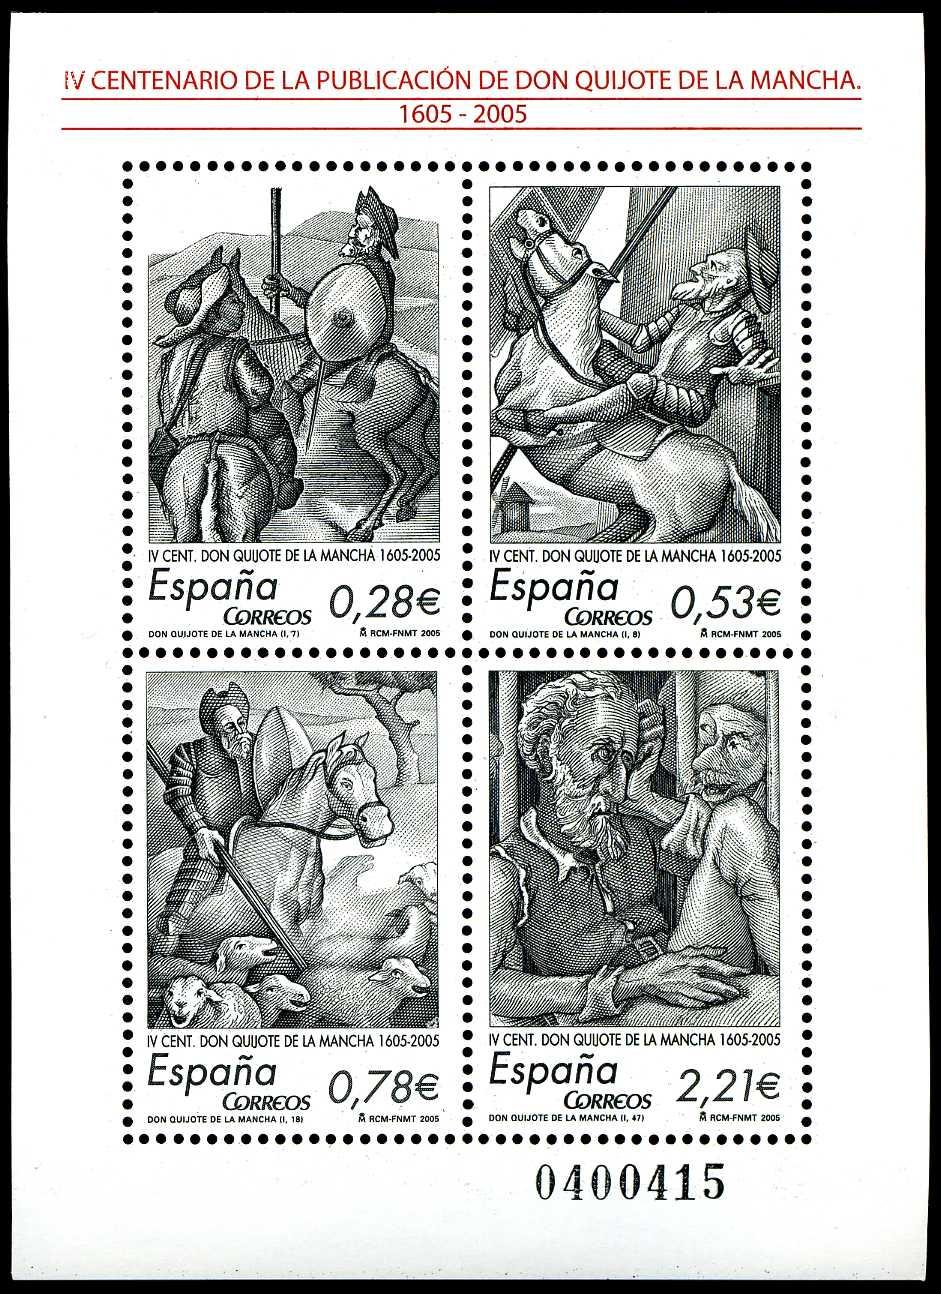 ES 010 2005 Don Quijote.jpg